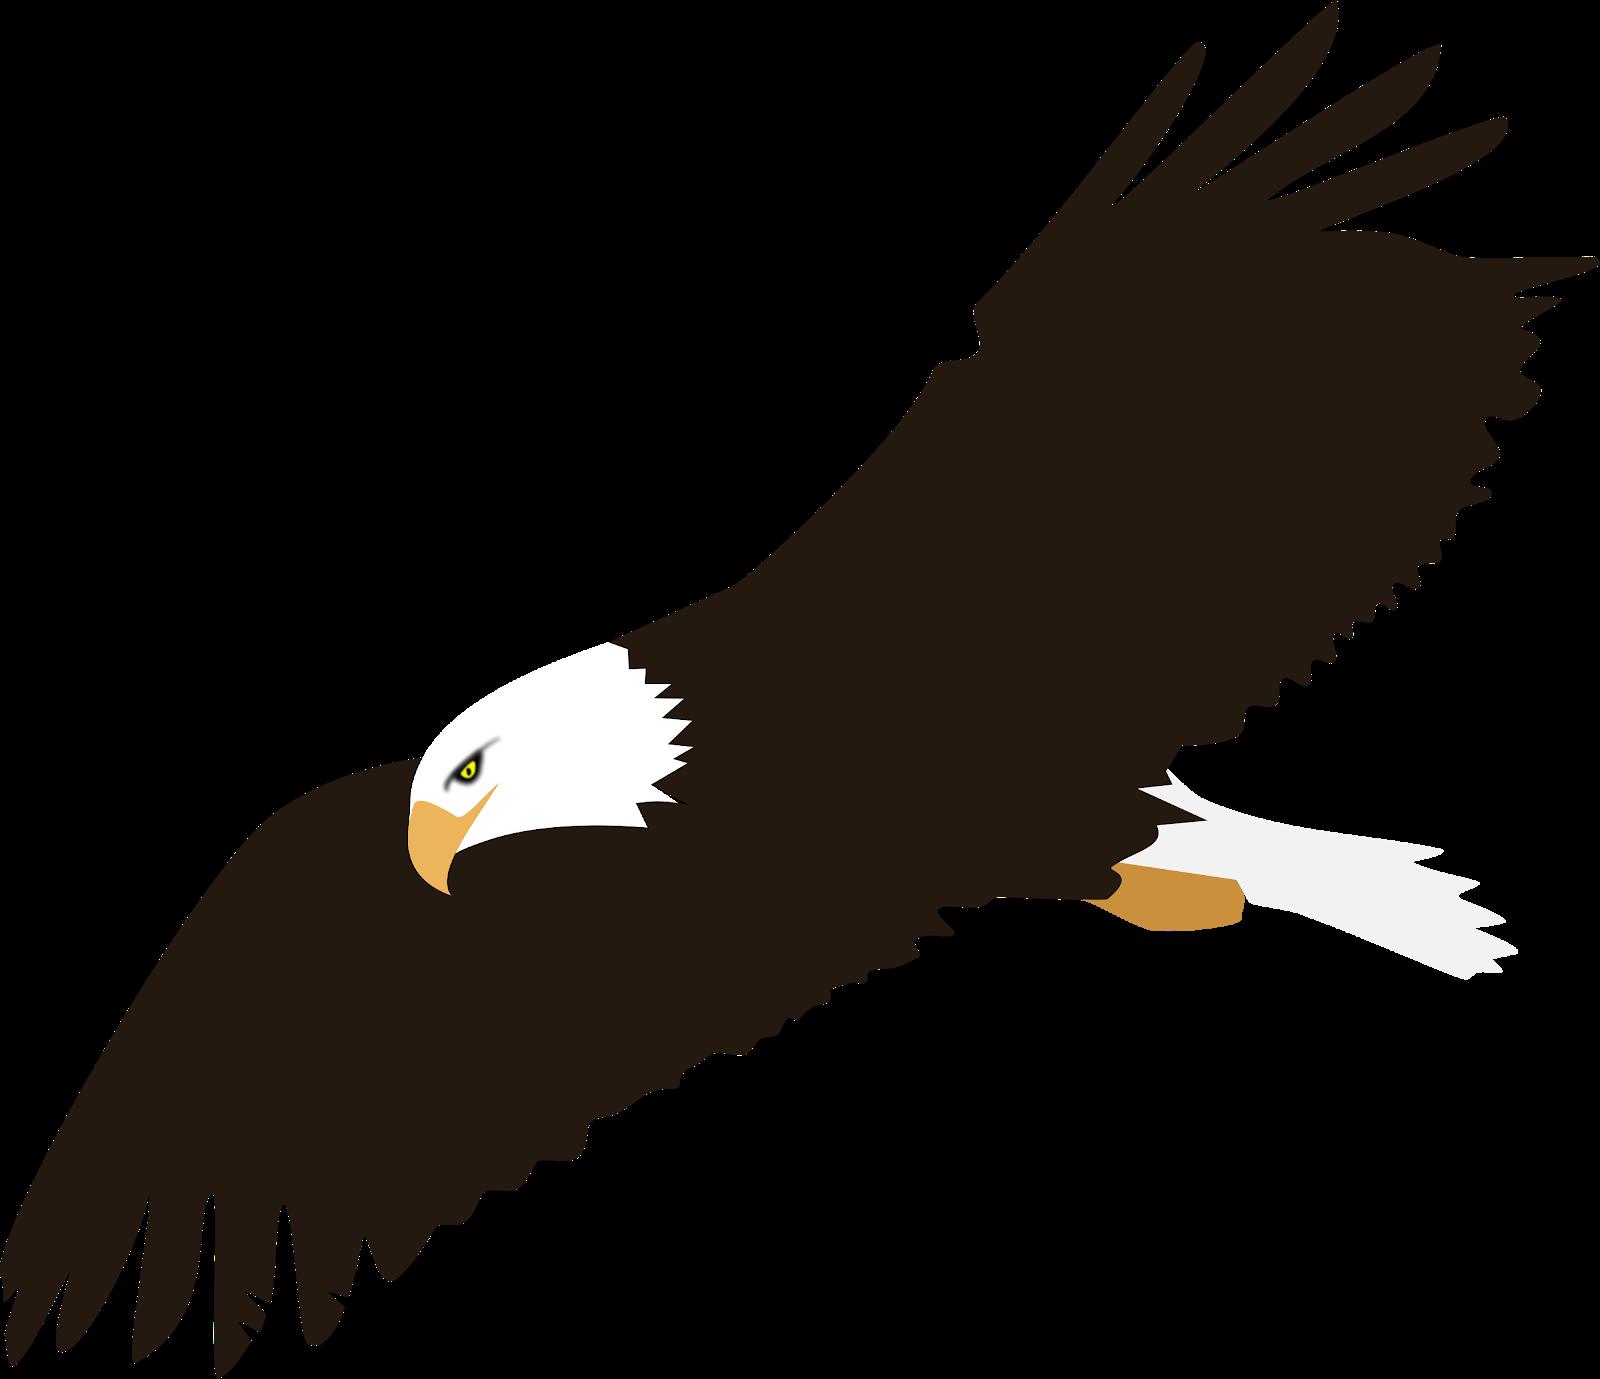 Eagle clipart school. Yvette lujan flores eld